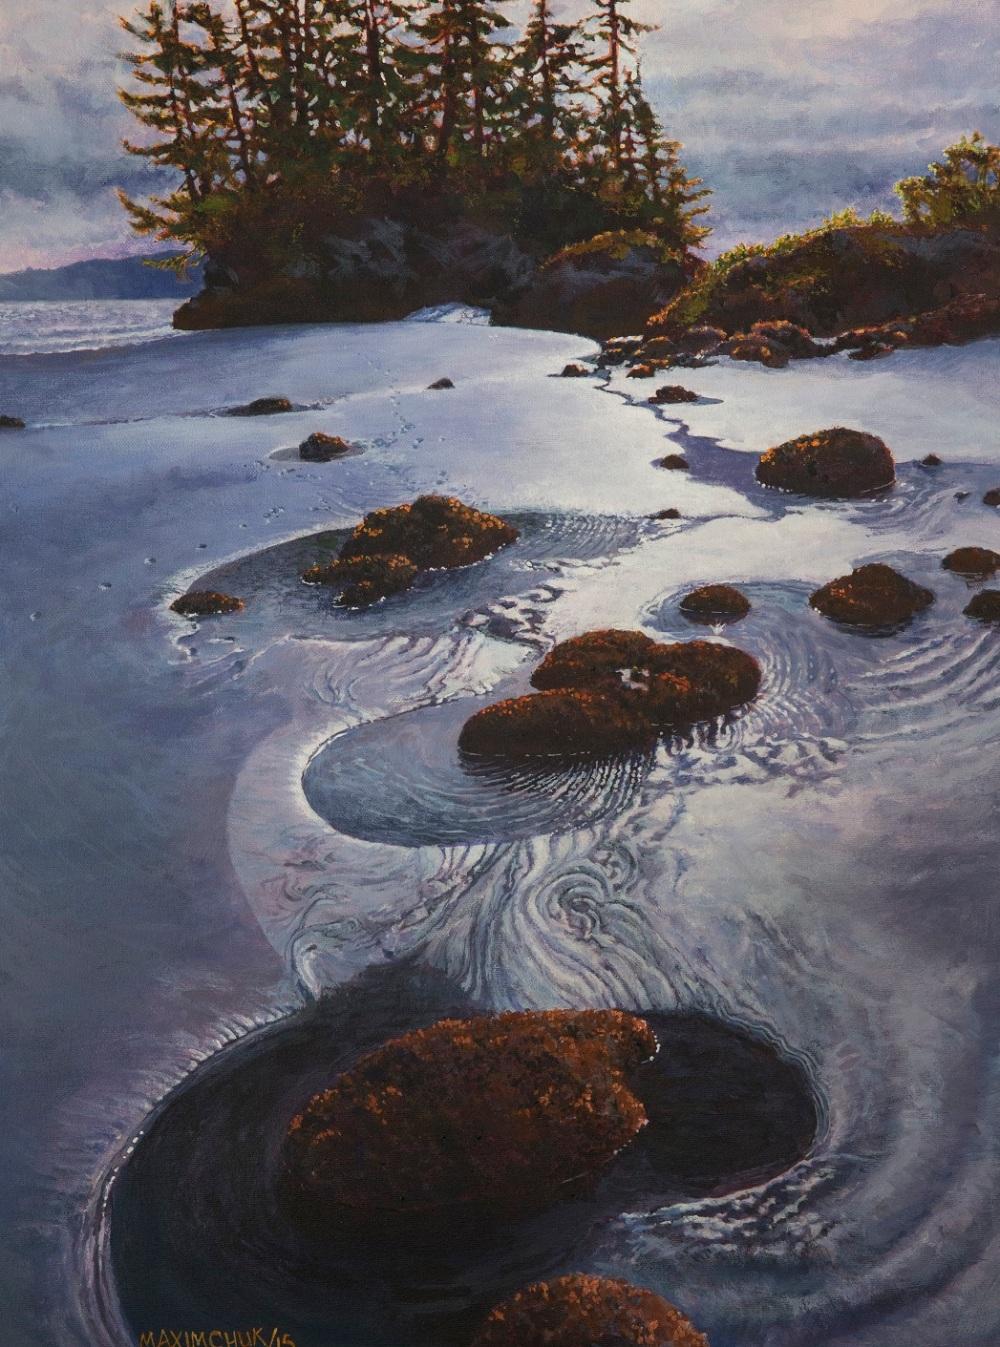 Acrylic-Tidepools-Yvonne-Maximchuk